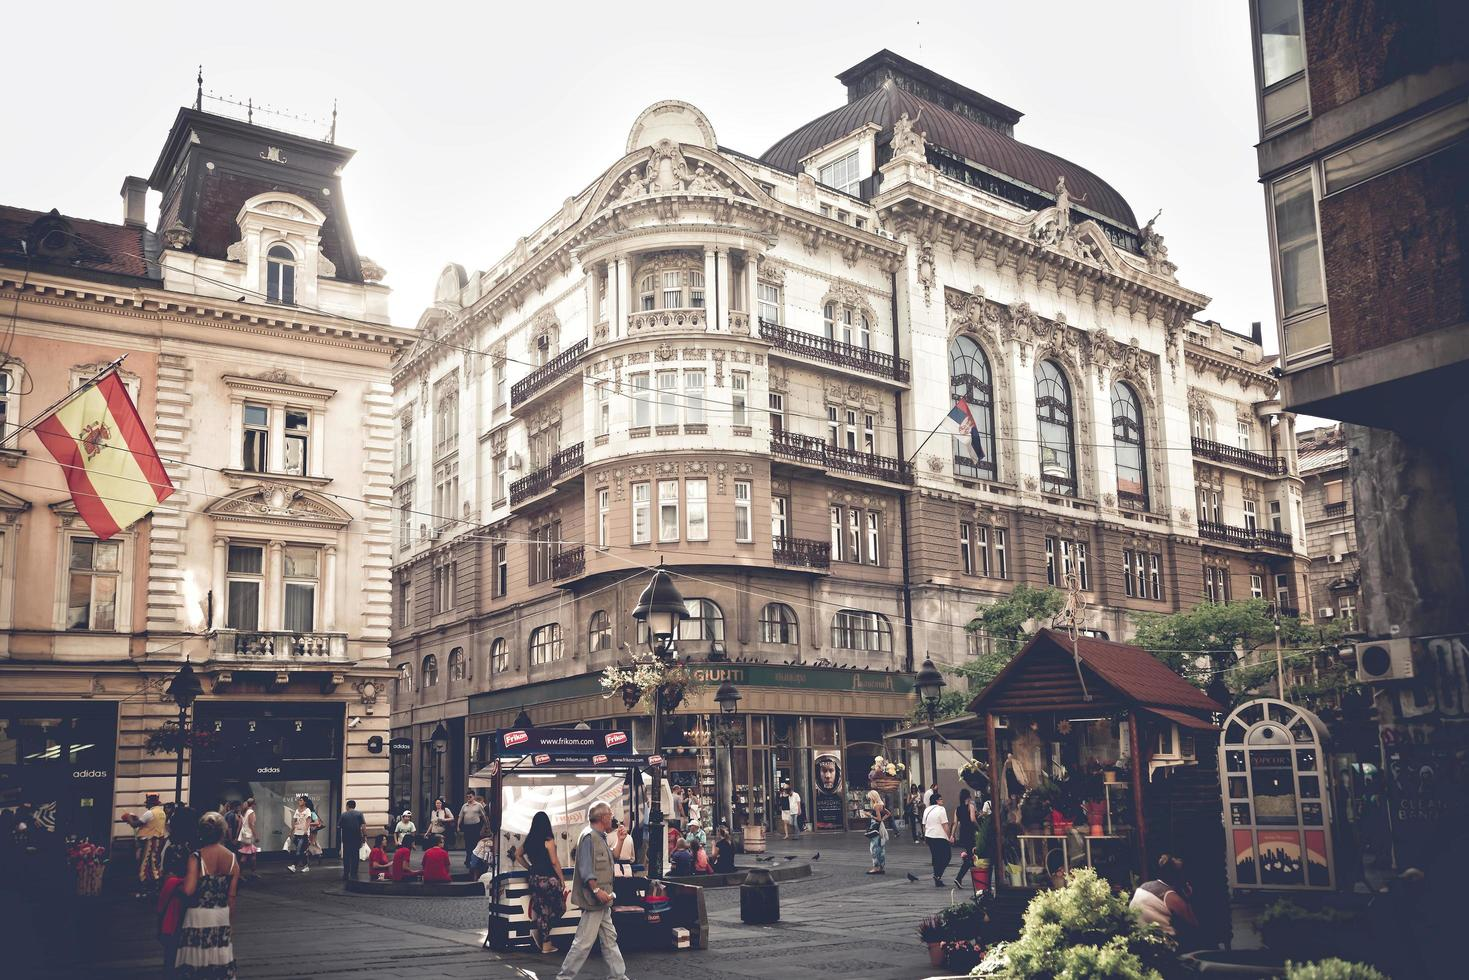 Belgrado, Serbia 2015 - Vista de la calle Knez Mihailova foto